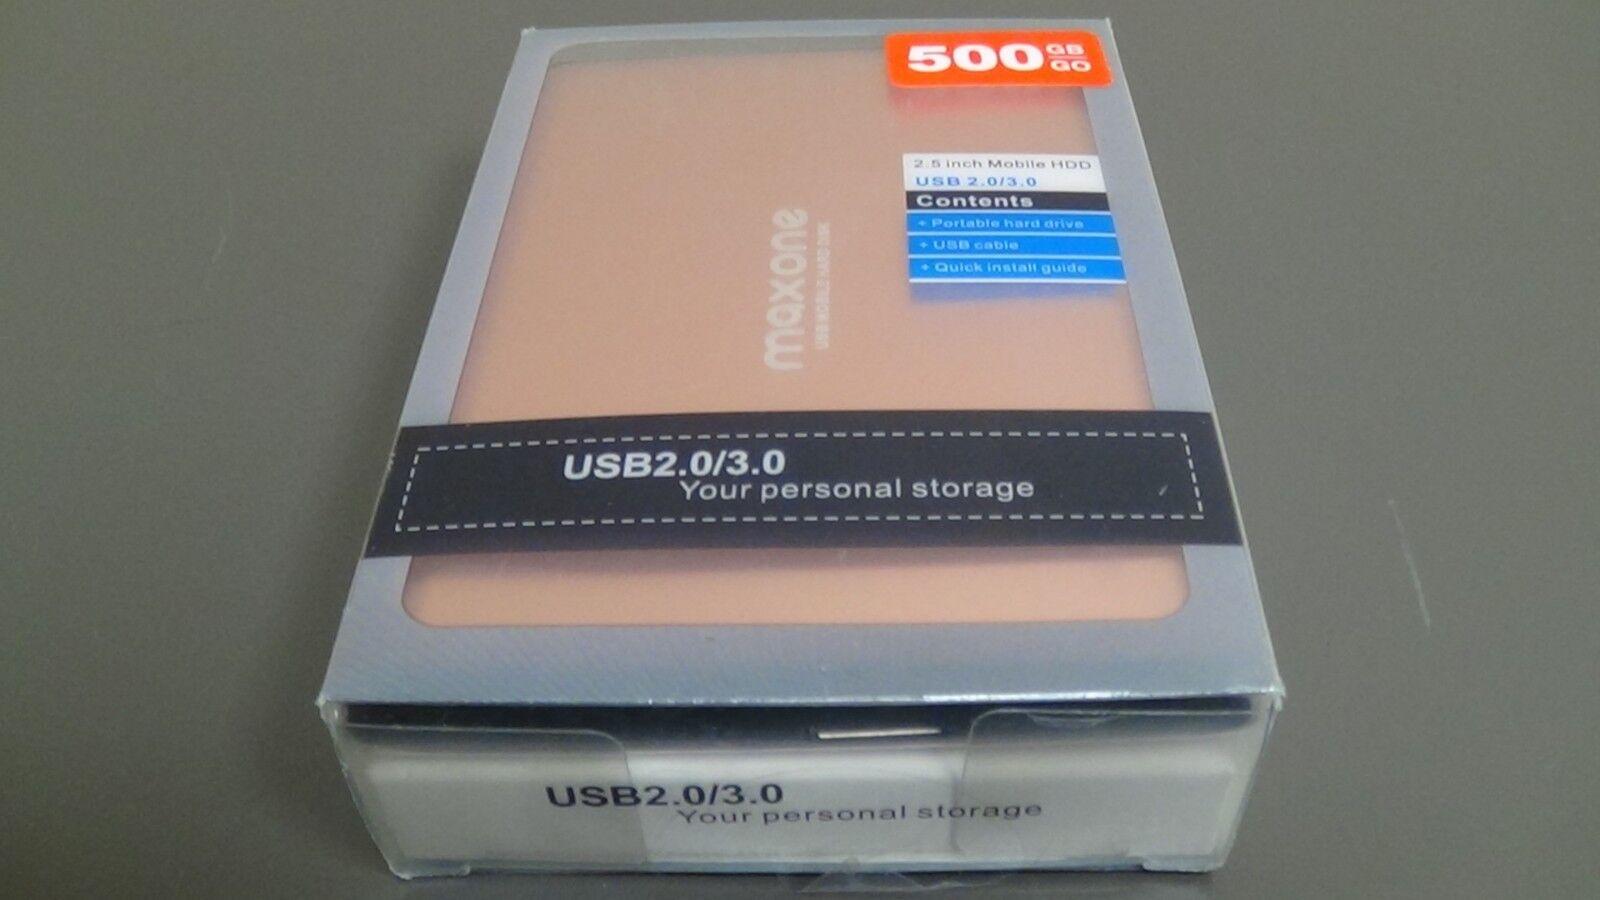 MAXONE 500GB Storage Portable Hard Drive USB 2.0/3.0 for Lap